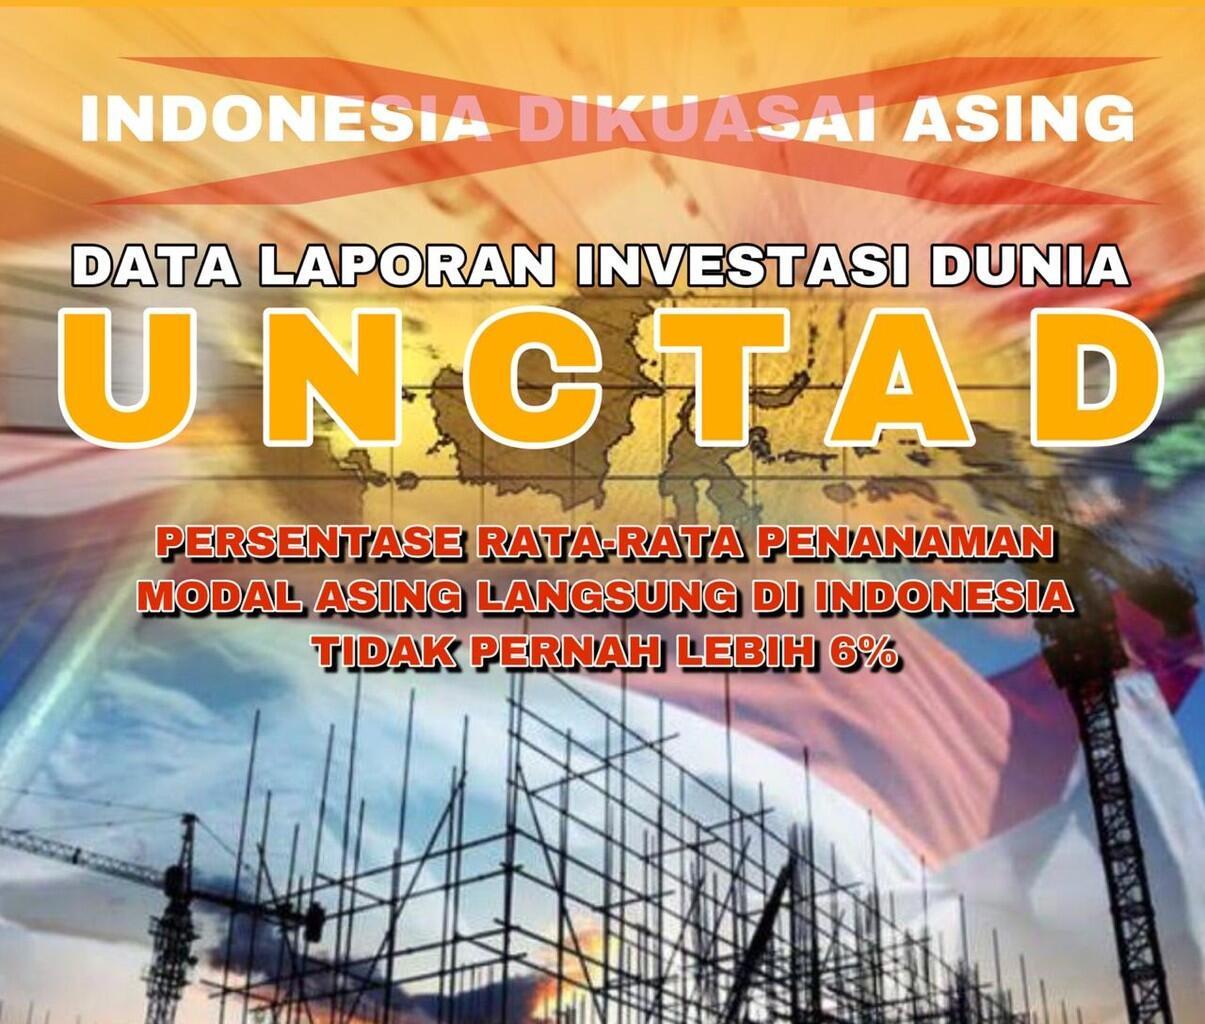 Tuduhan Sesat Ekonomi Kebodohan ala Prabowo, Berani Bicara Tanpa Data